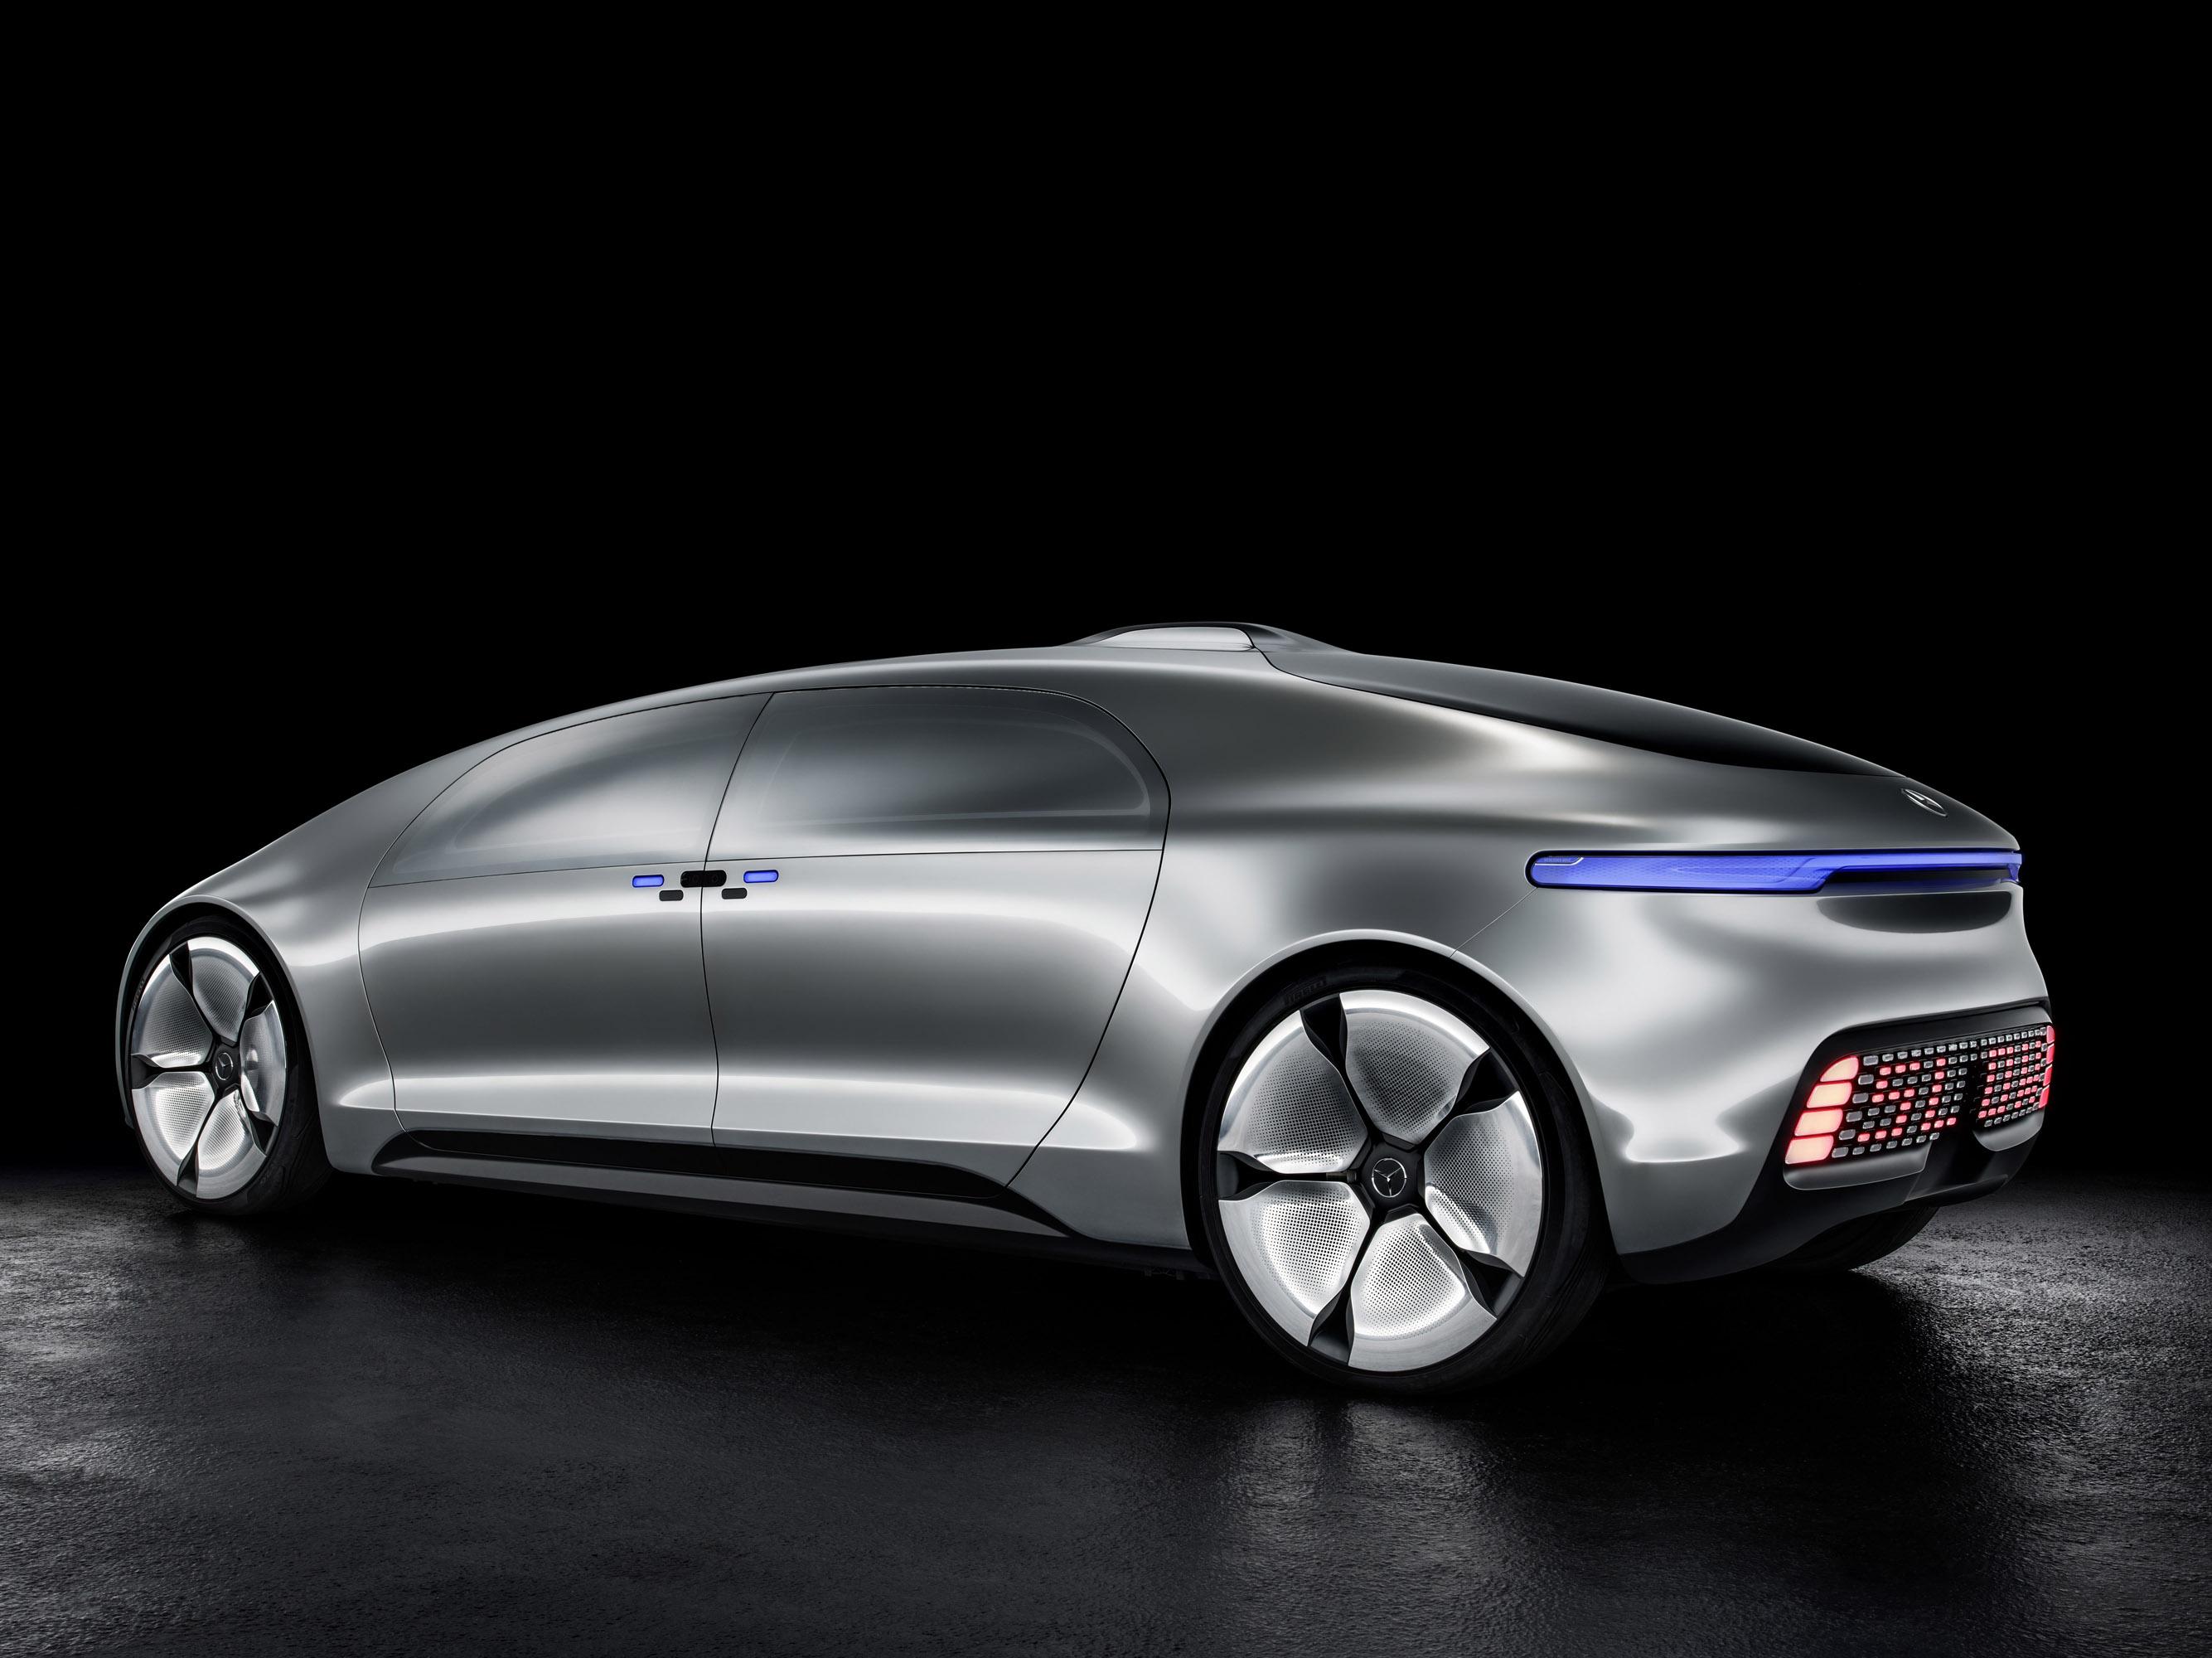 Mercedes benz f 015 luxury in motion automobile revolution for Mercedes benz luxury